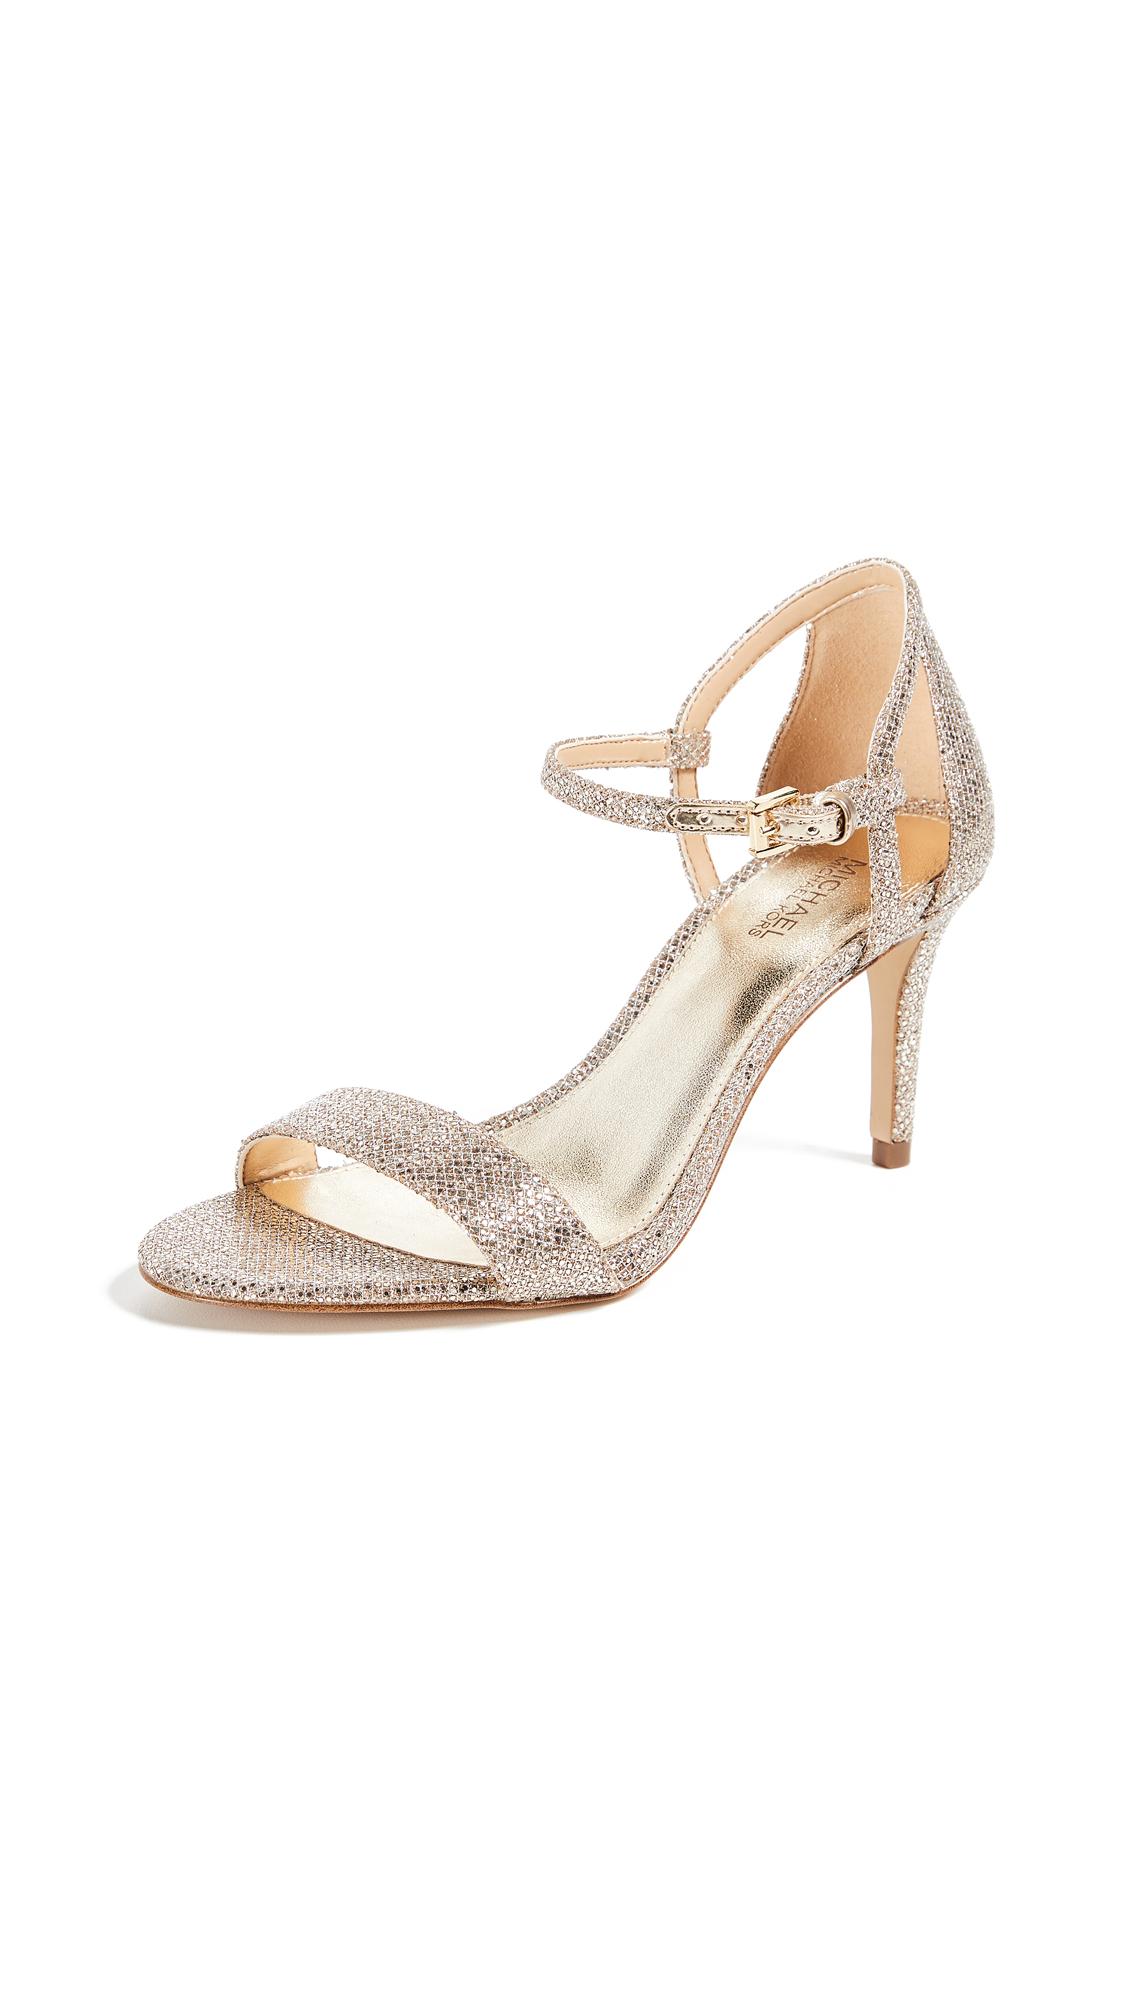 MICHAEL Michael Kors Simone Mid Sandals - Silver/Sand